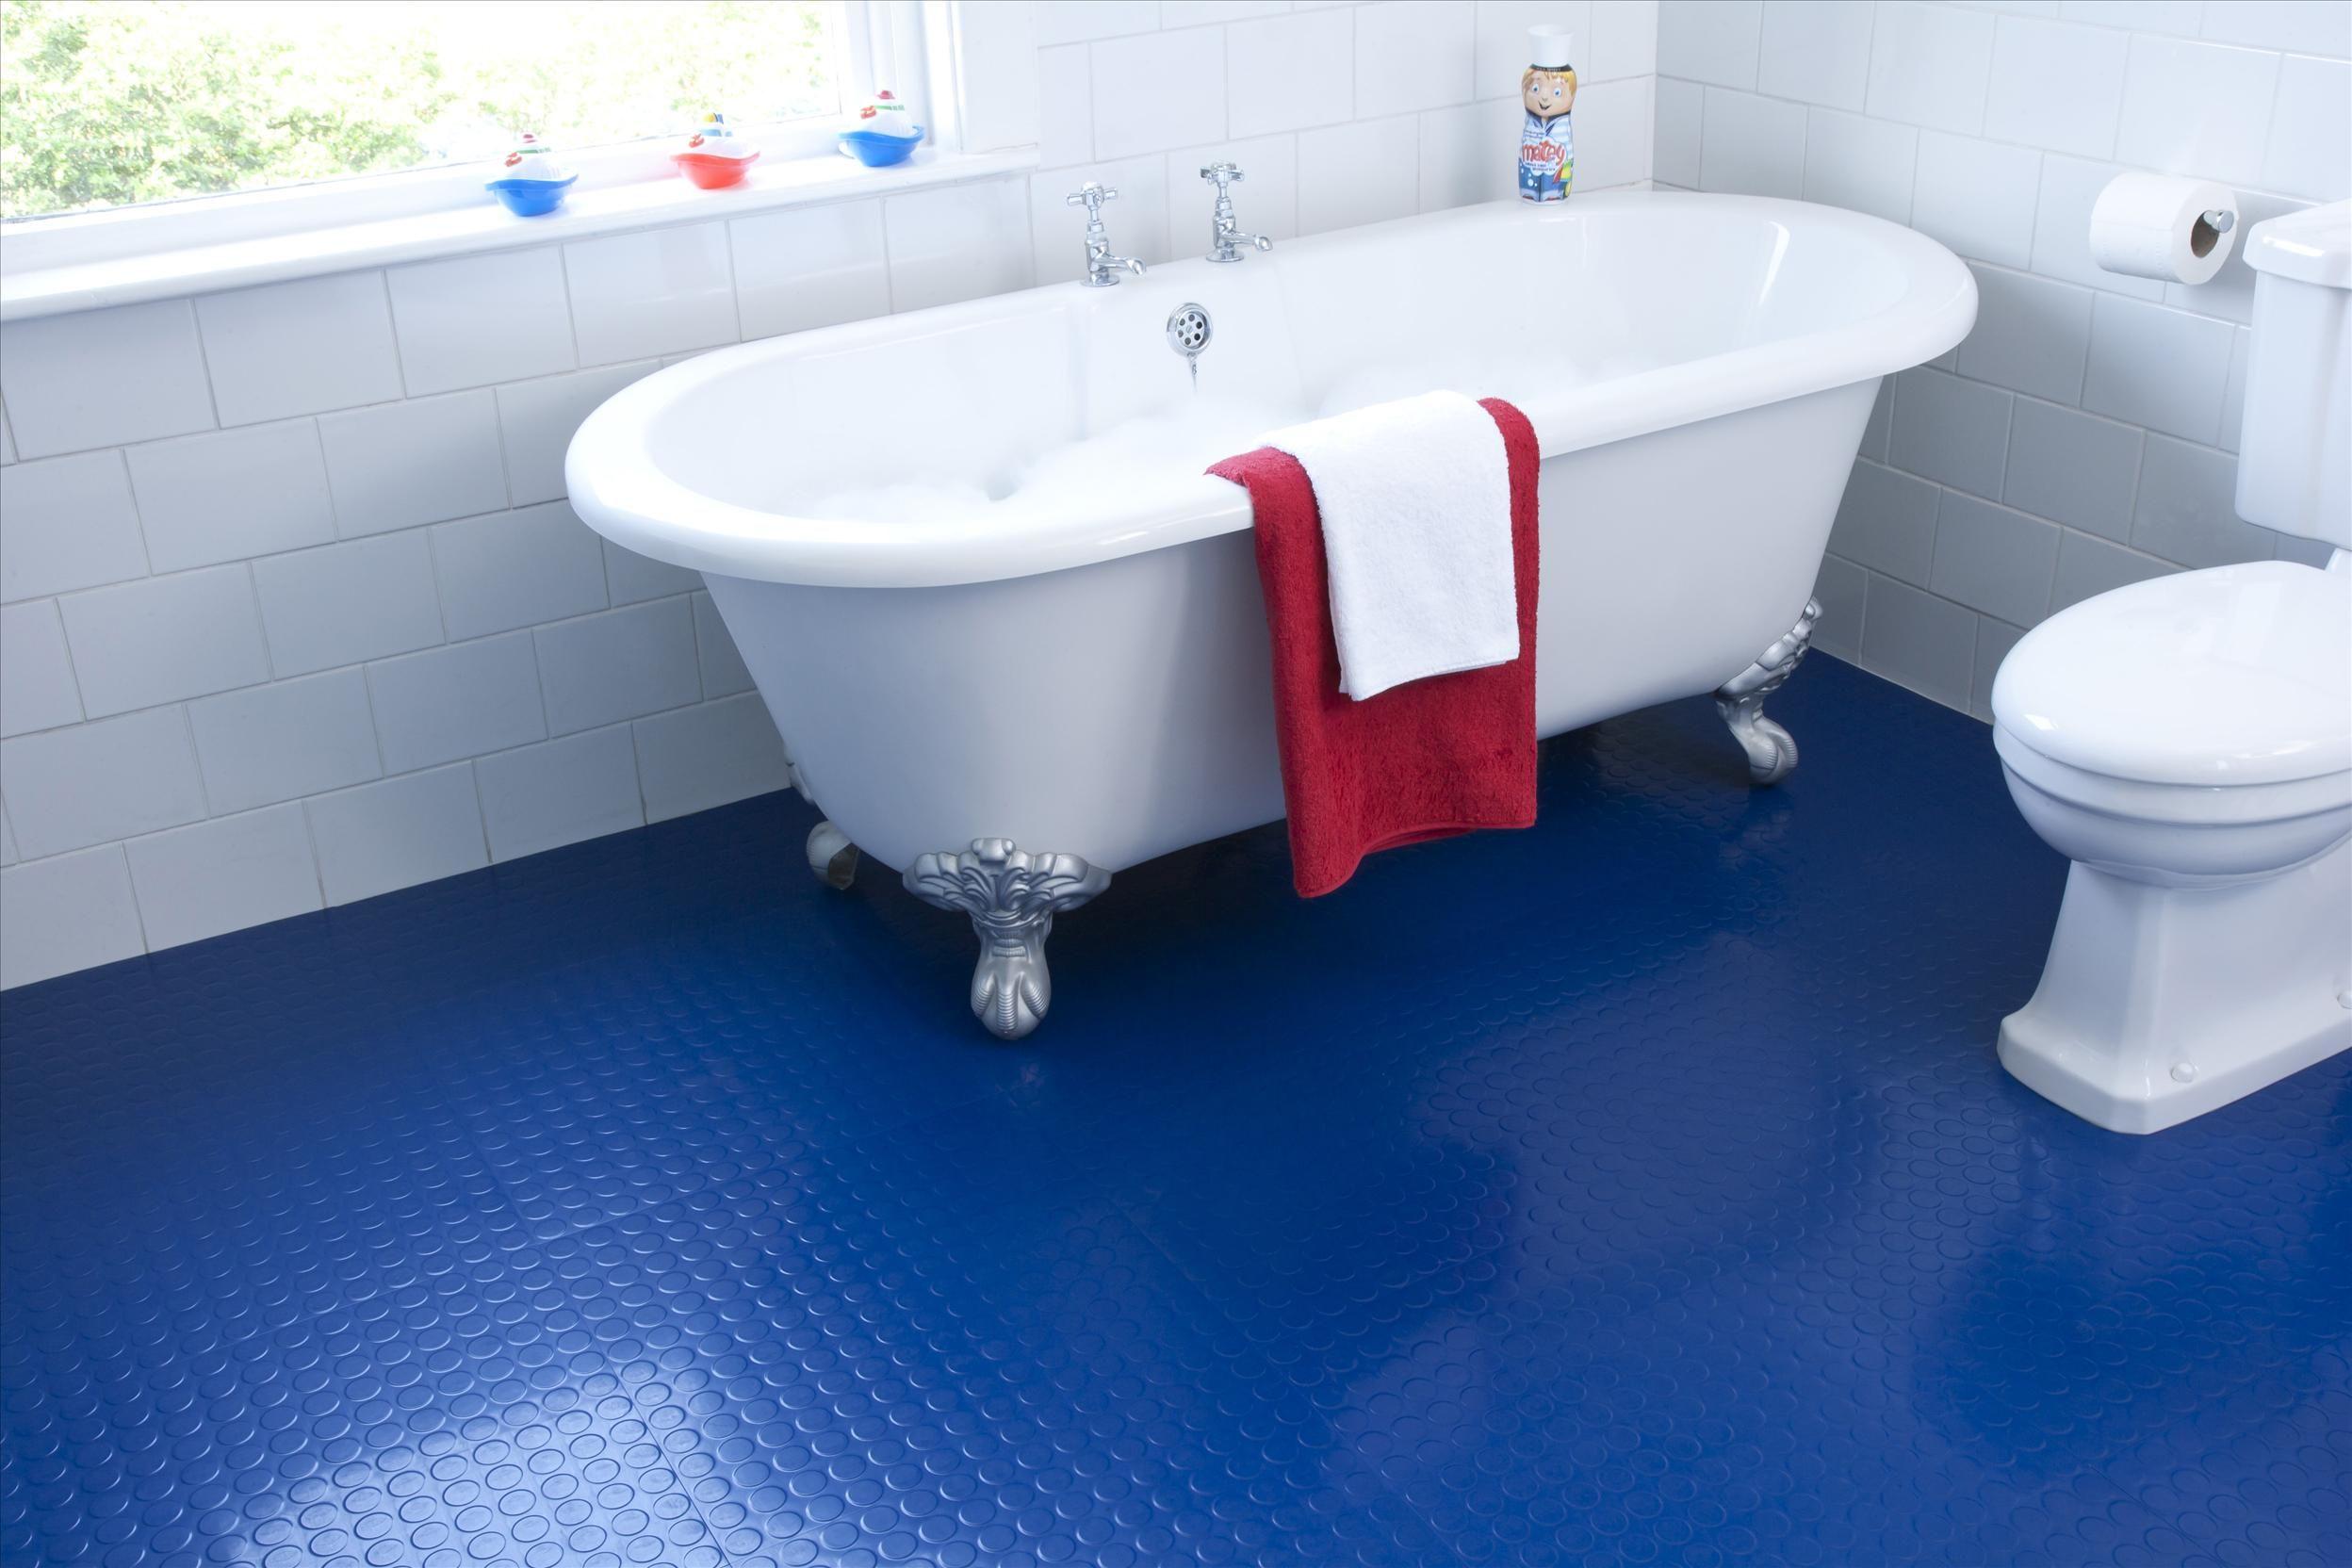 blue bathroom floor tile. Cool Fancy Ideas : Blue Rubber Floor Tile In Minimalist Bathroom Image Id 32108 - GiesenDesign E